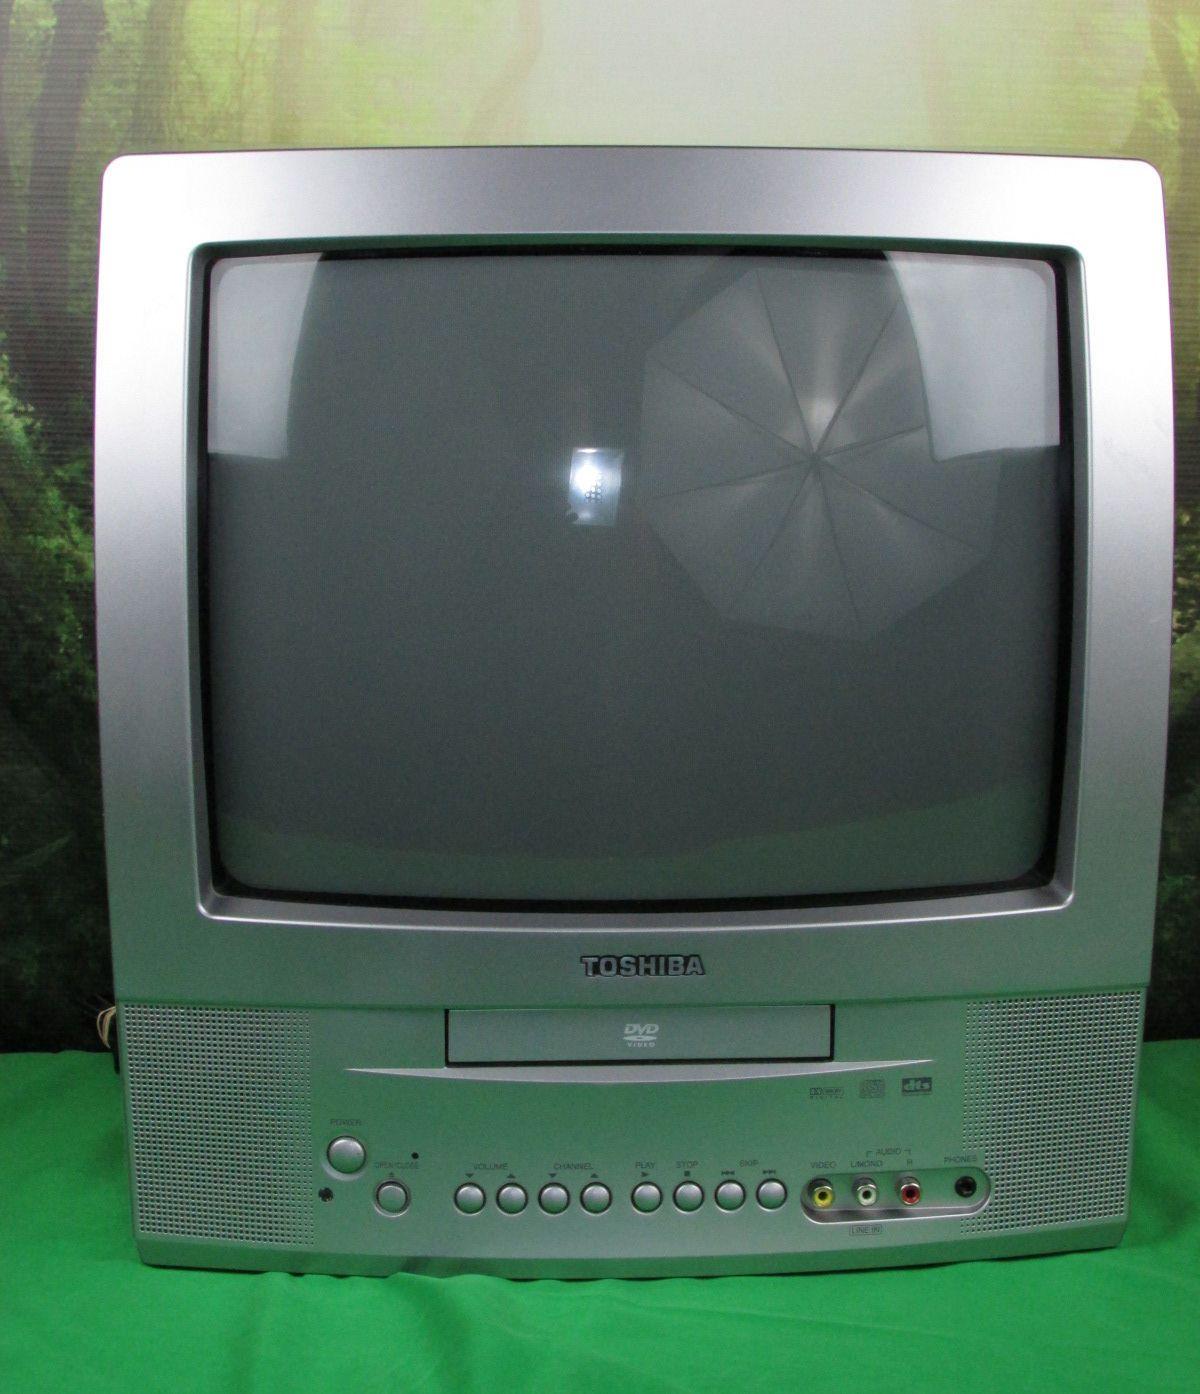 toshiba md13p1 13 crt tv color built in dvd video player. Black Bedroom Furniture Sets. Home Design Ideas